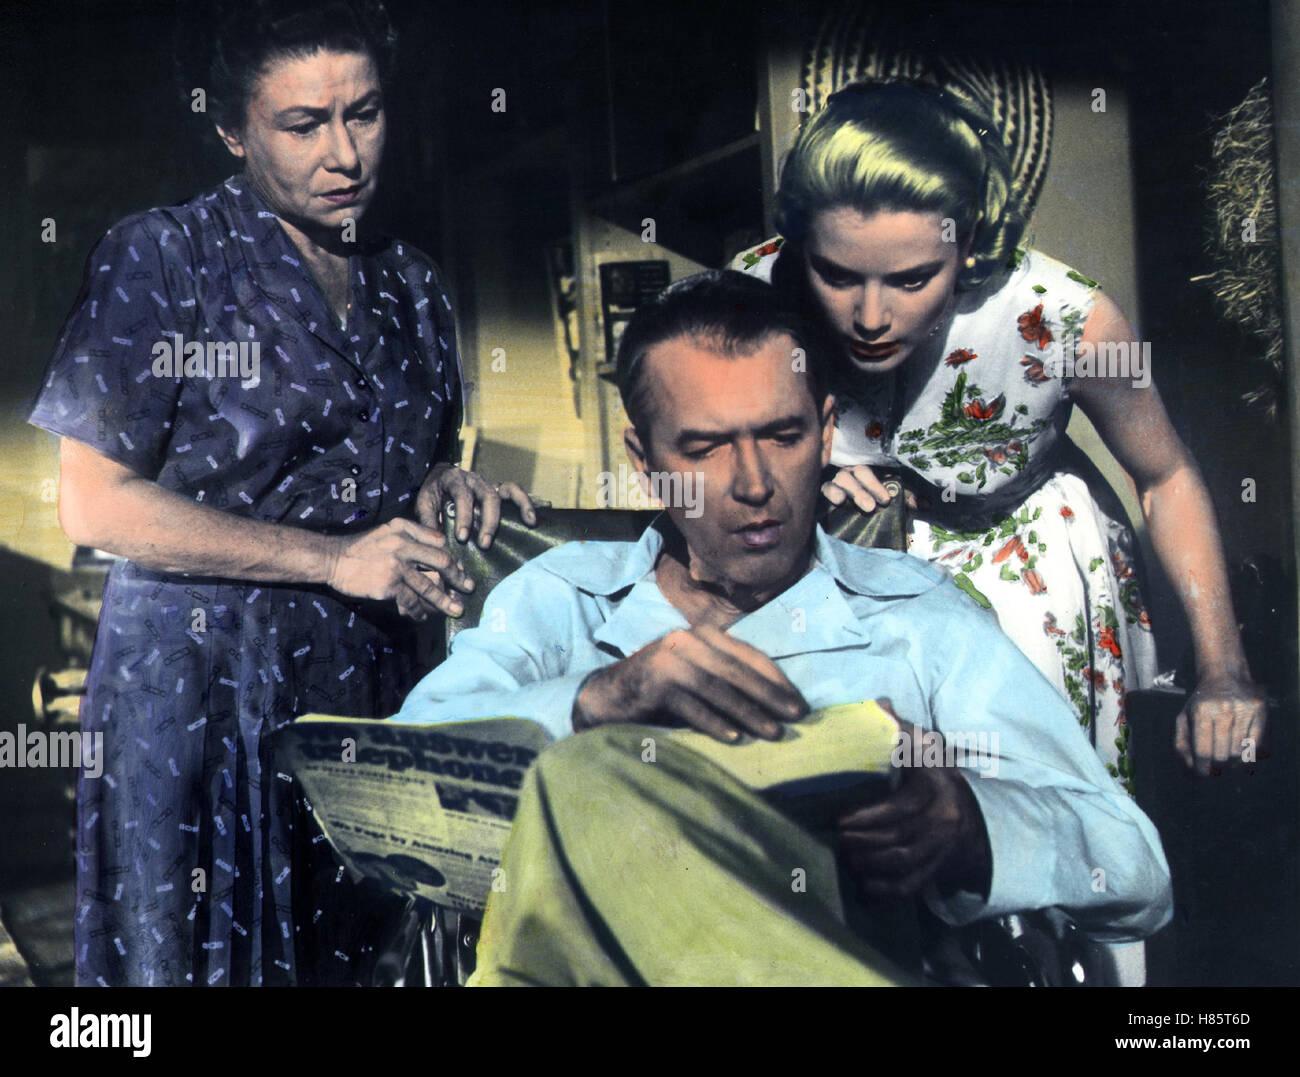 Das Fenster zum Hof, (REAR WINDOW) USA 1954, Regie: Alfred Hitchcock, THELMA RITTER, JAMES STEWART, GRACE KELLY - Stock Image